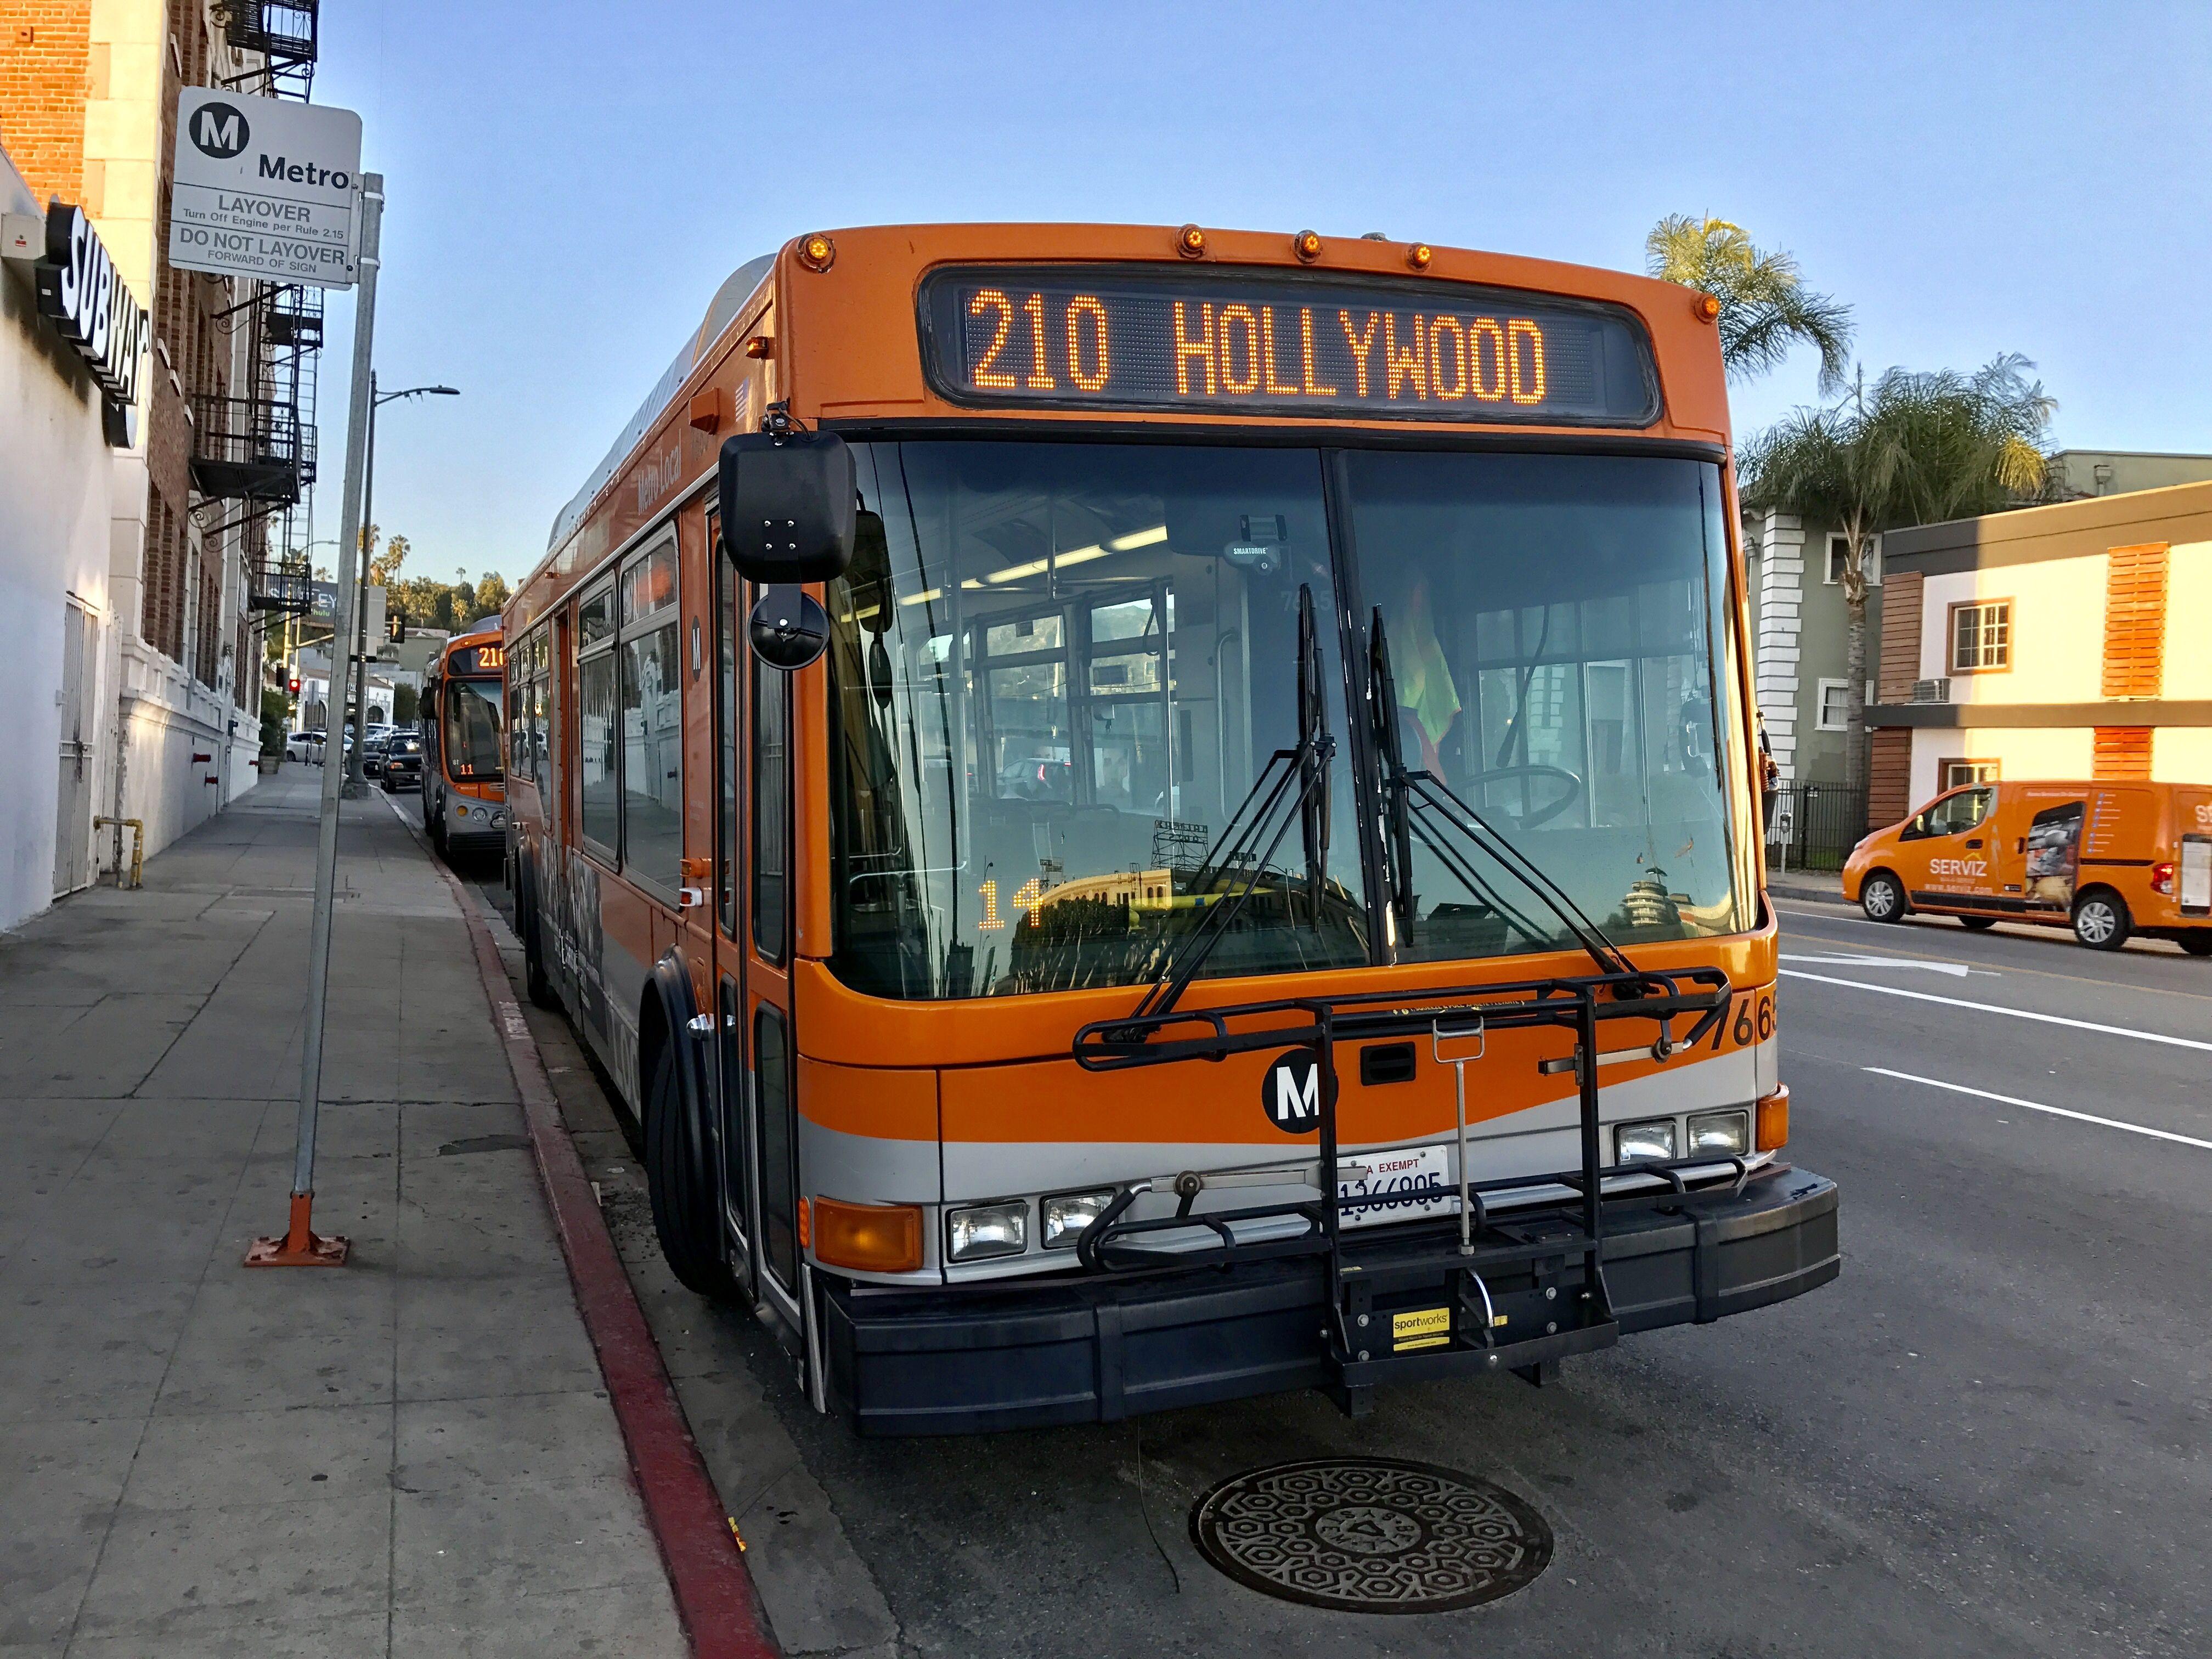 c40c591d9065c726020e142fd10243ae - How To Get From Lax To Hollywood By Public Transportation